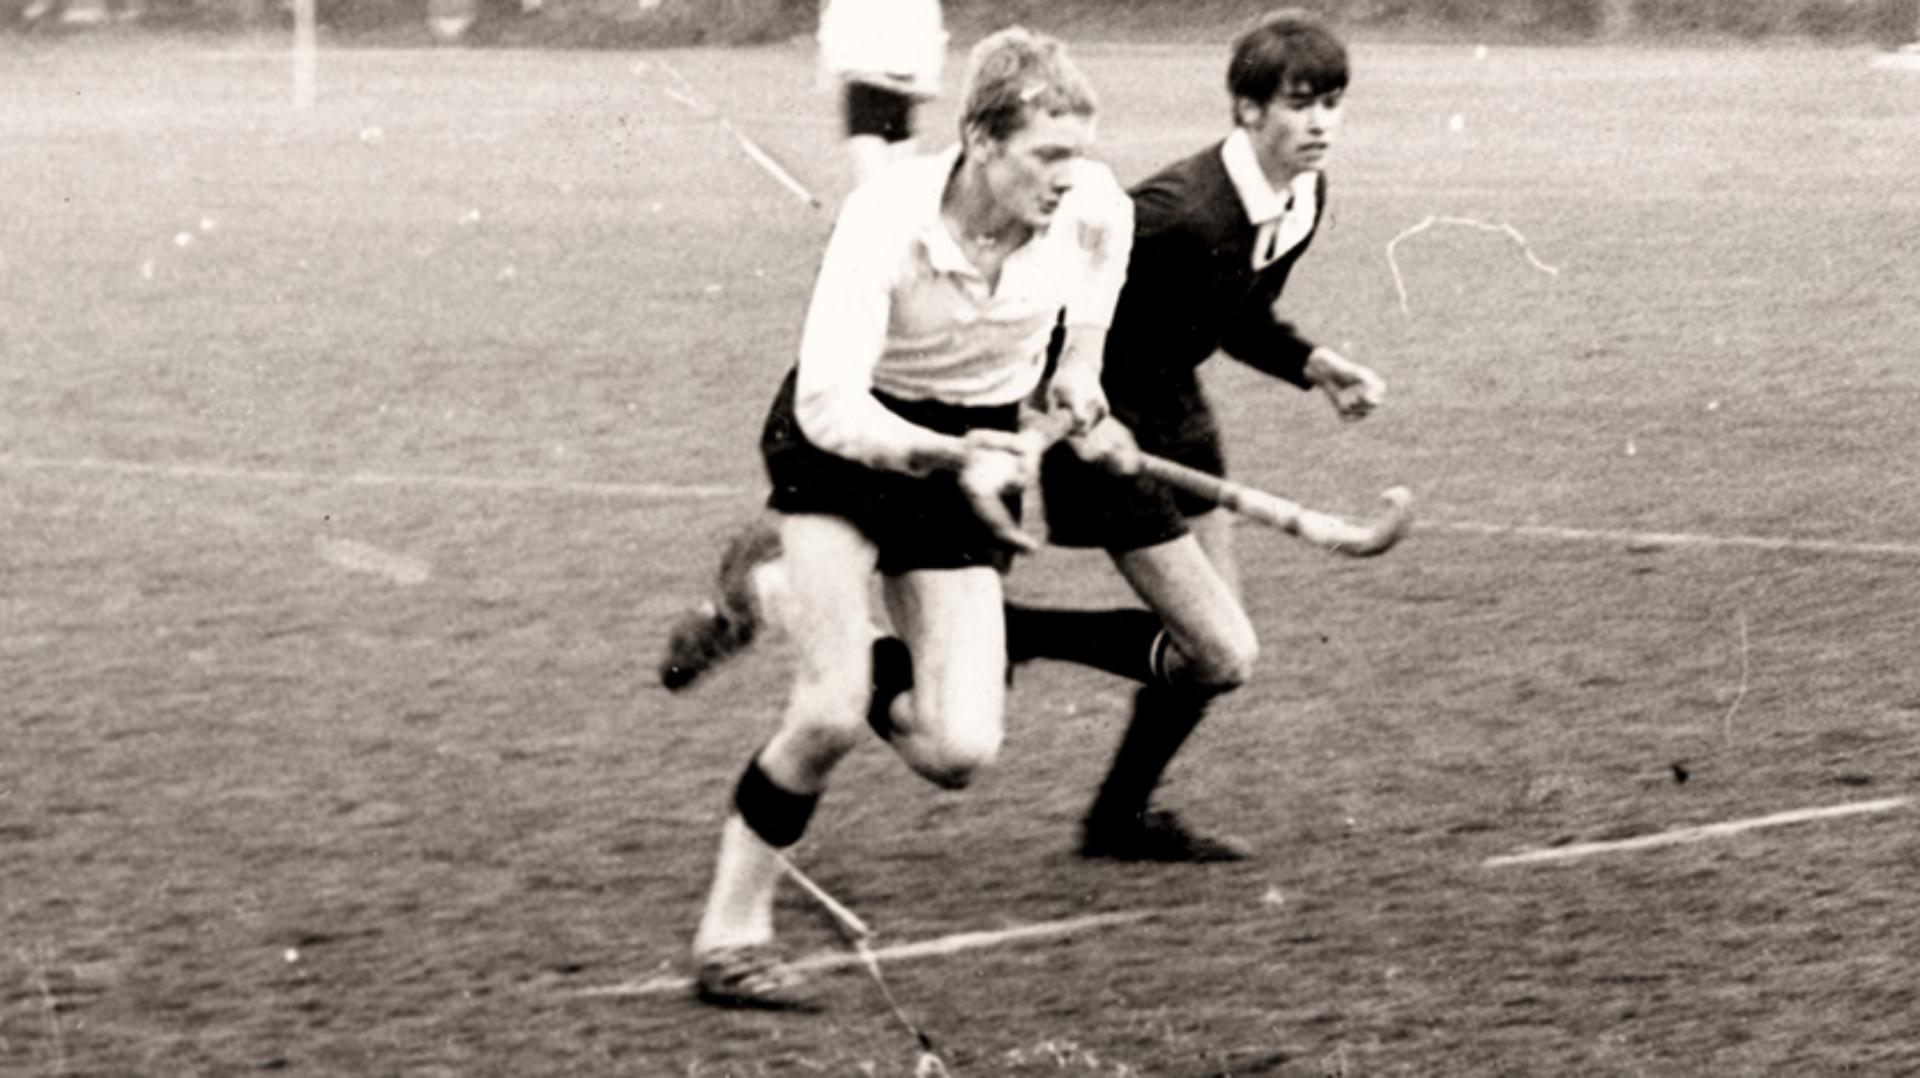 A teenage James Dyson playing hockey